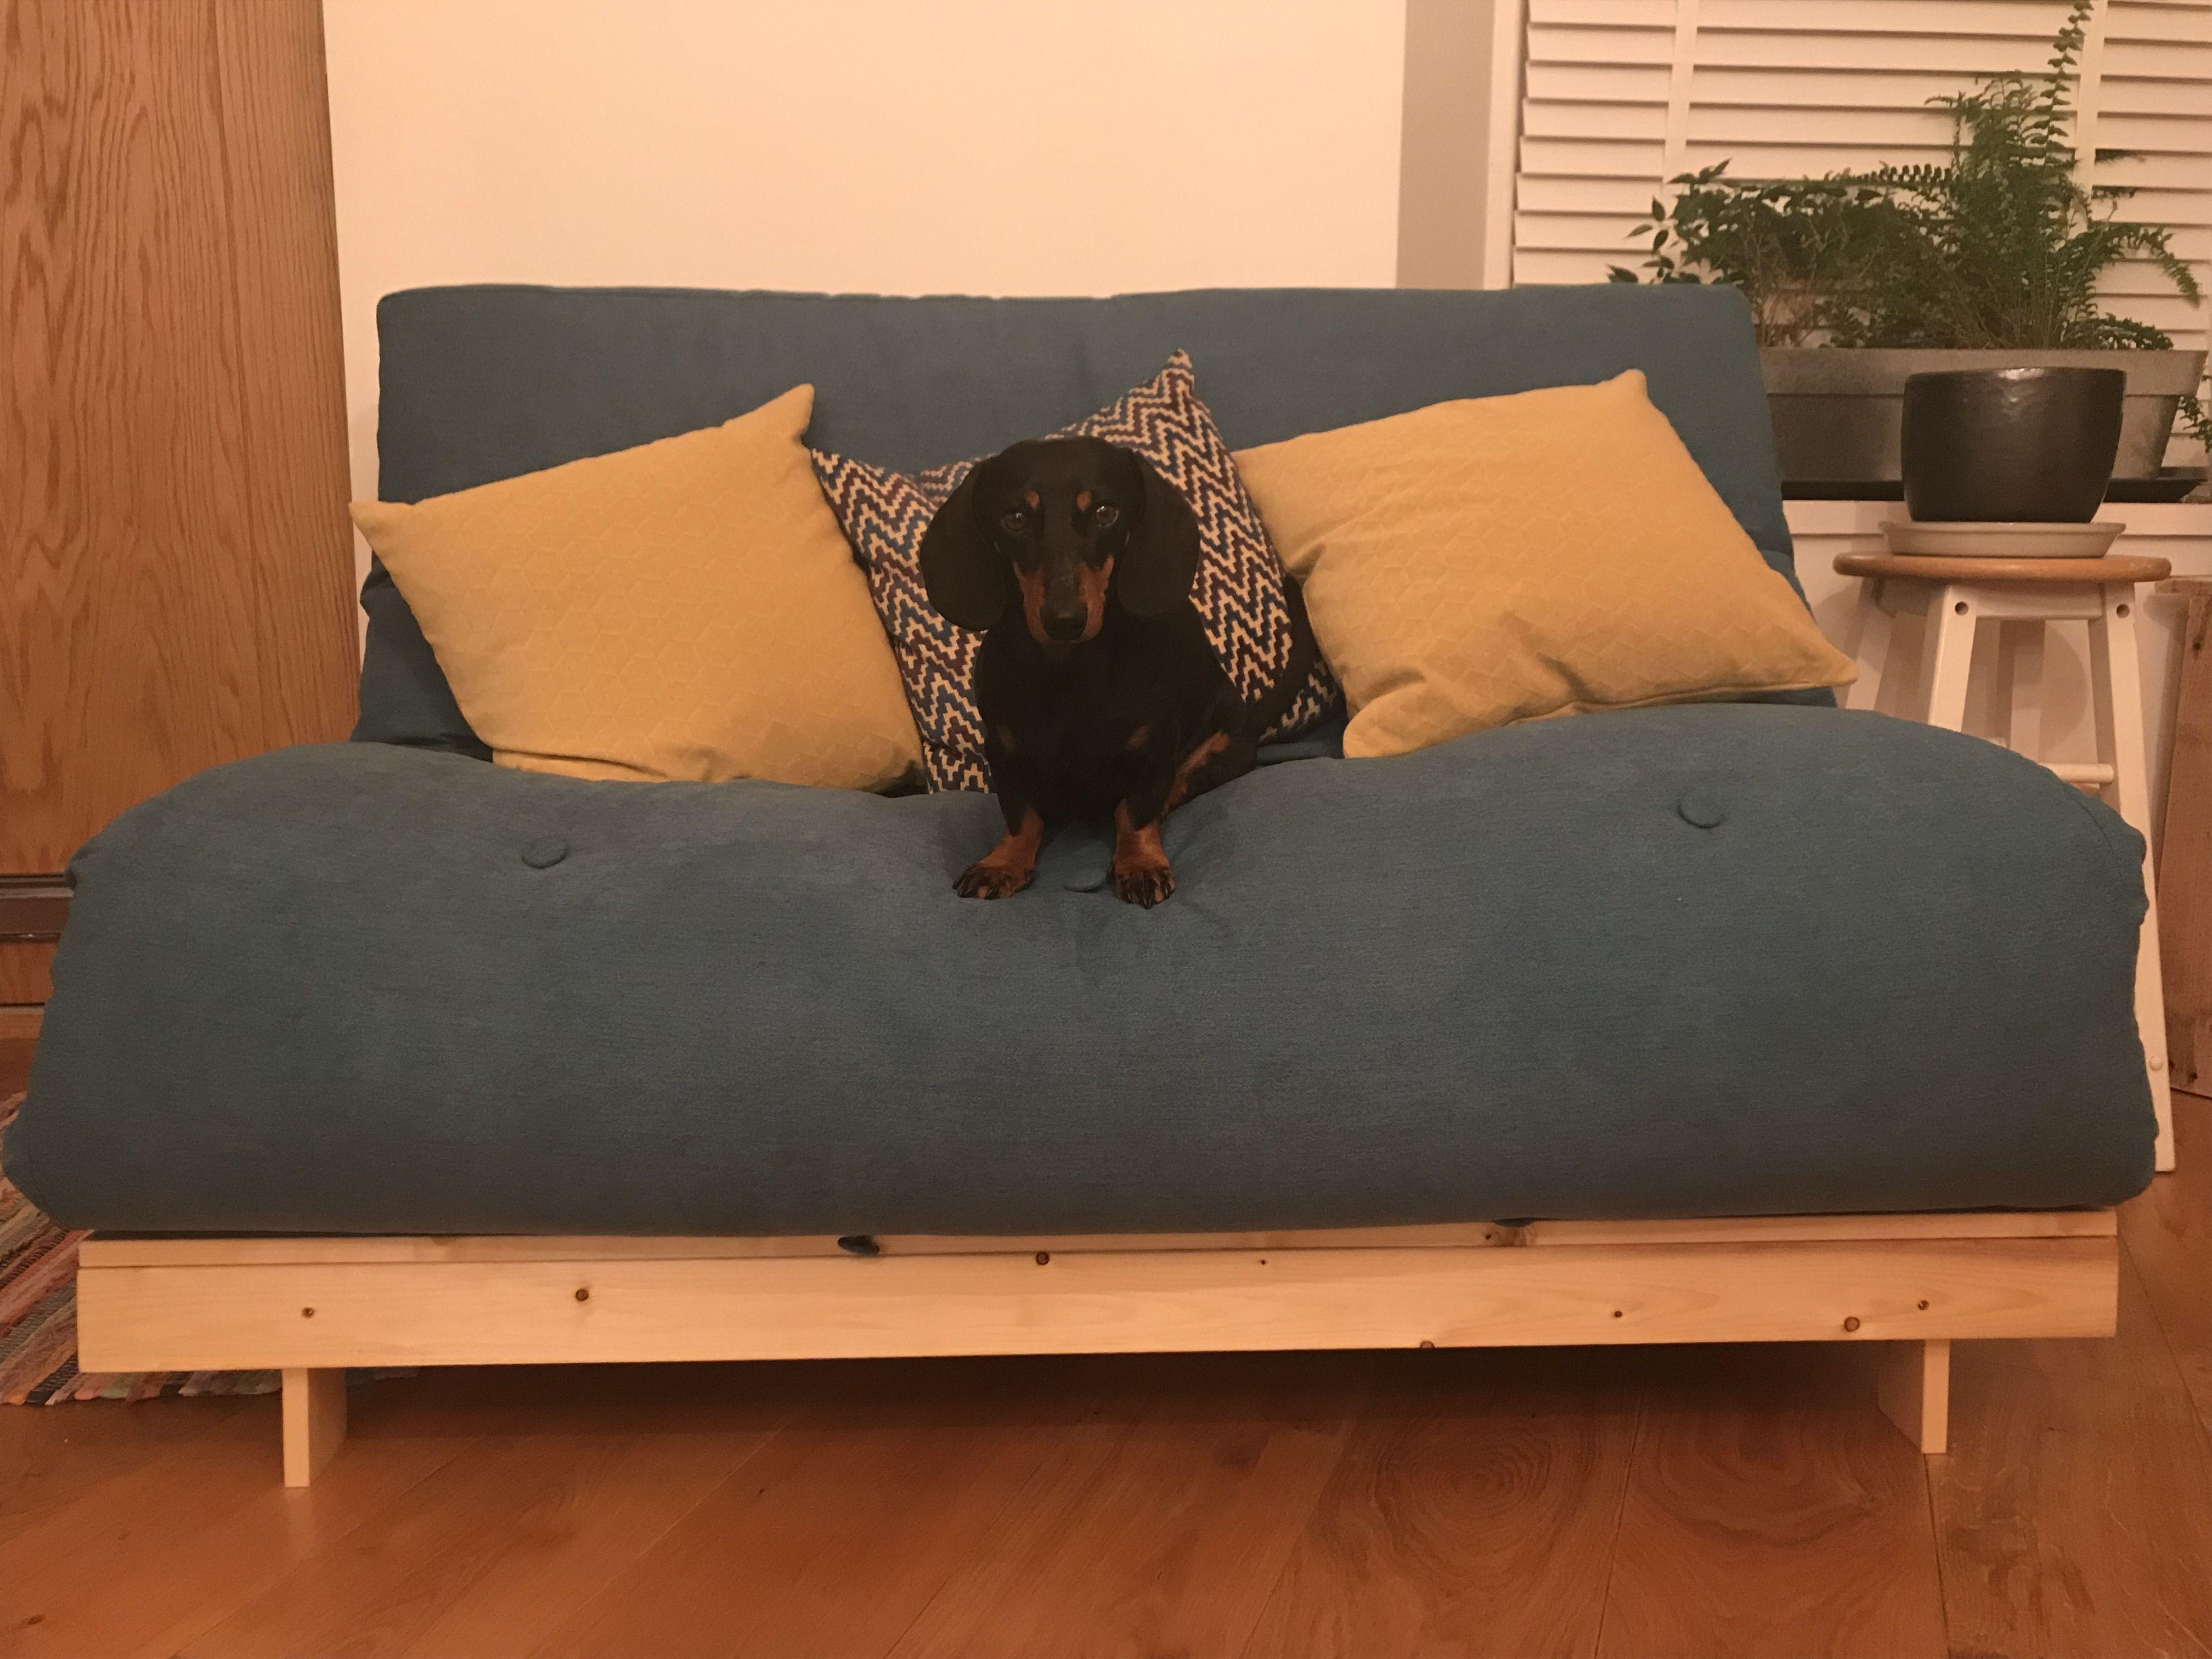 Magnificent Senjo Double Futon Sofa Bed Fabric Choice And Uk Wide Machost Co Dining Chair Design Ideas Machostcouk